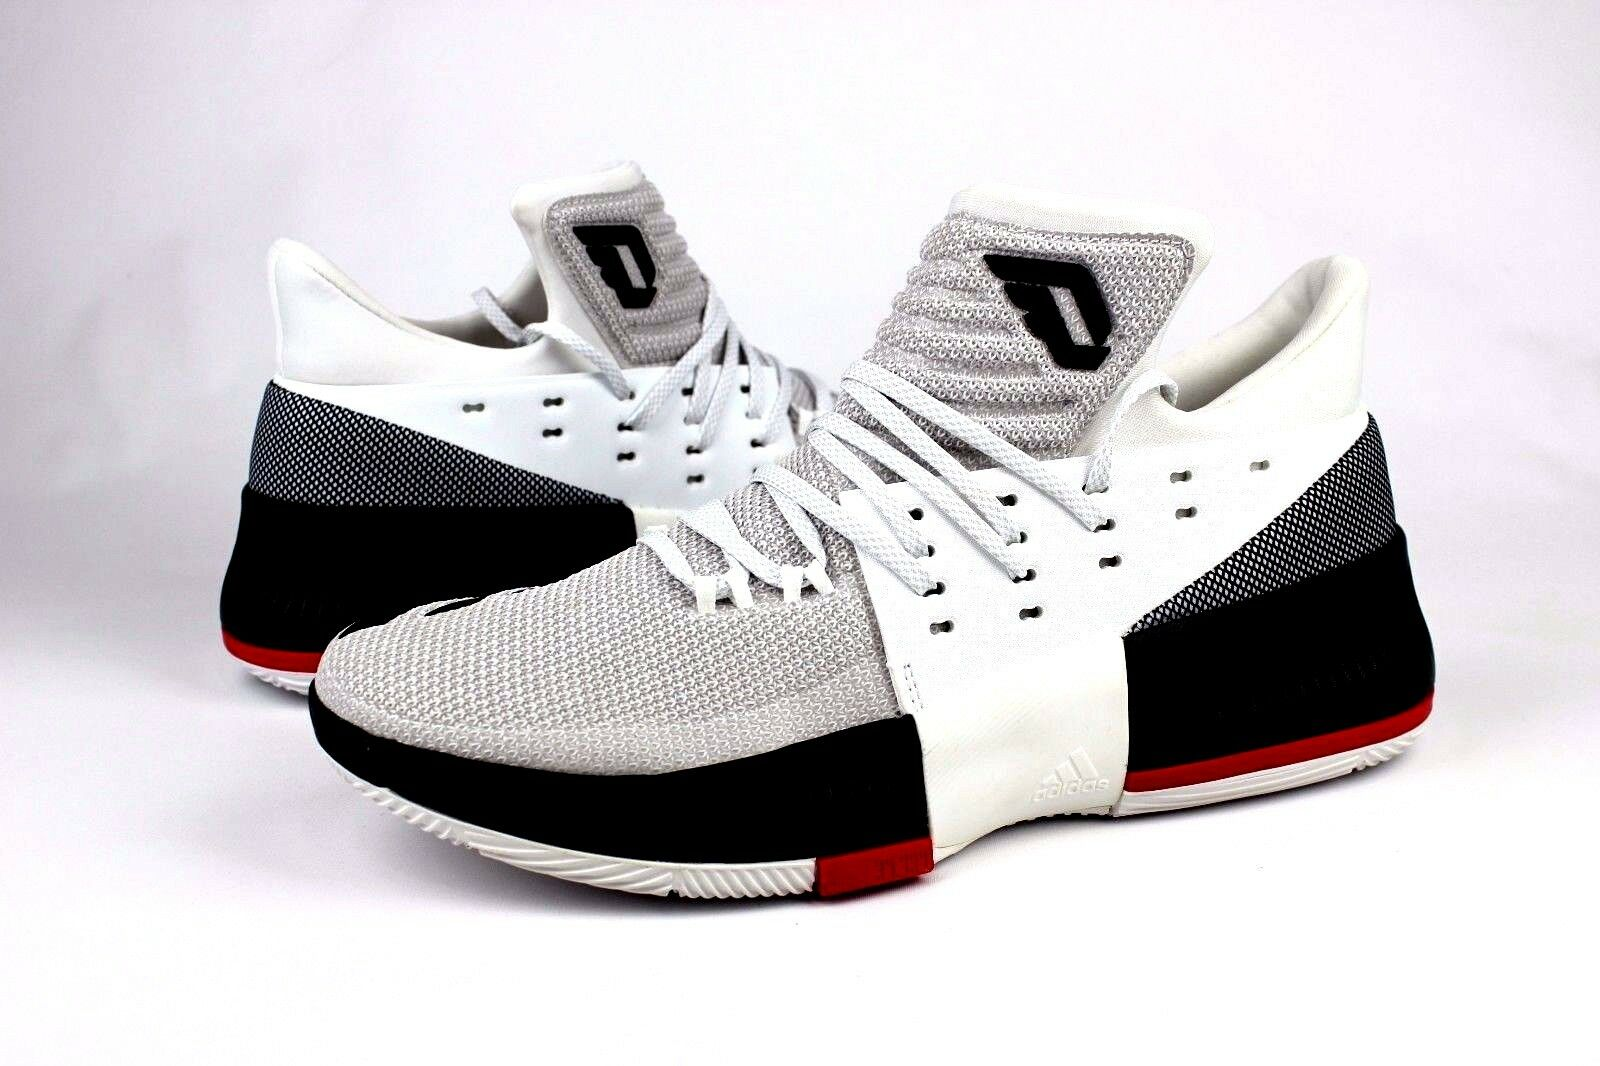 Adidas Damian Lillard Dame 3 WBR BB8268 Basketball Shoes Comfortable